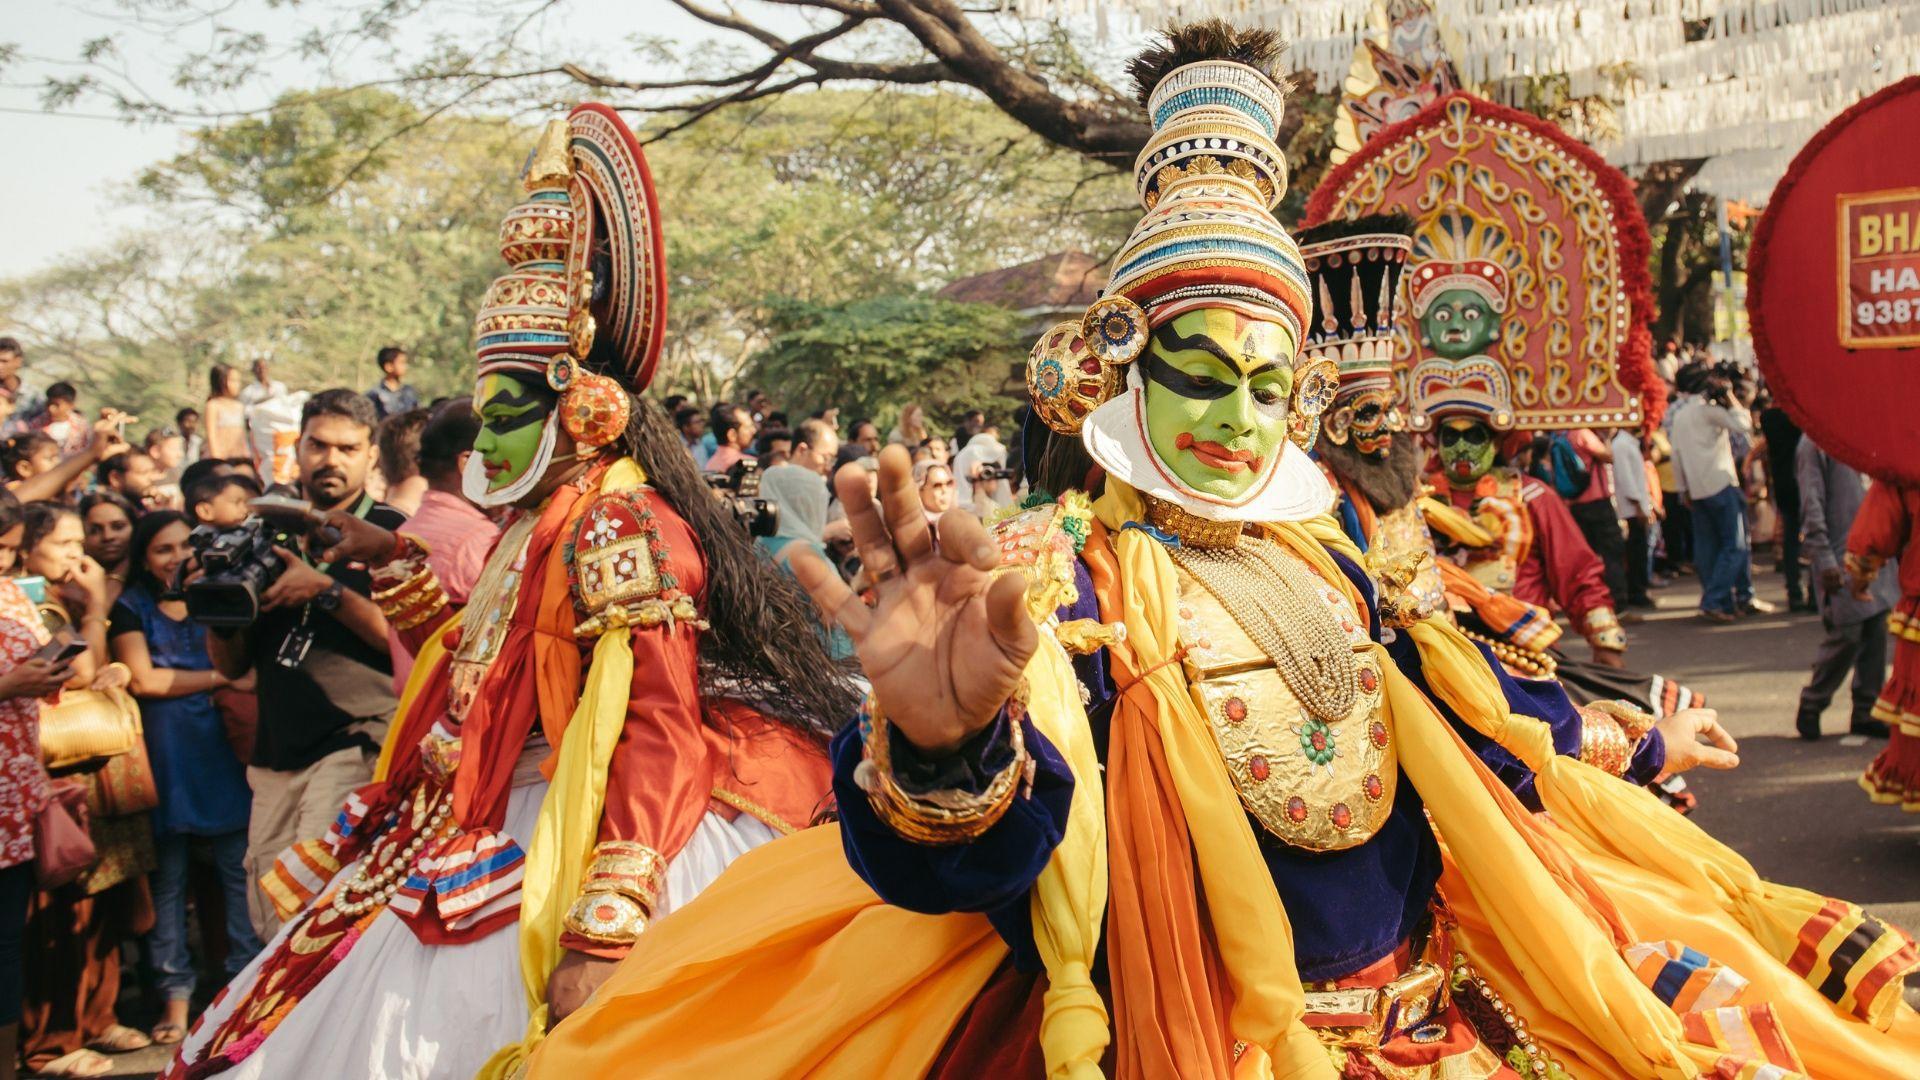 Spalvingi karnavalai - Indijos kultūros dalis